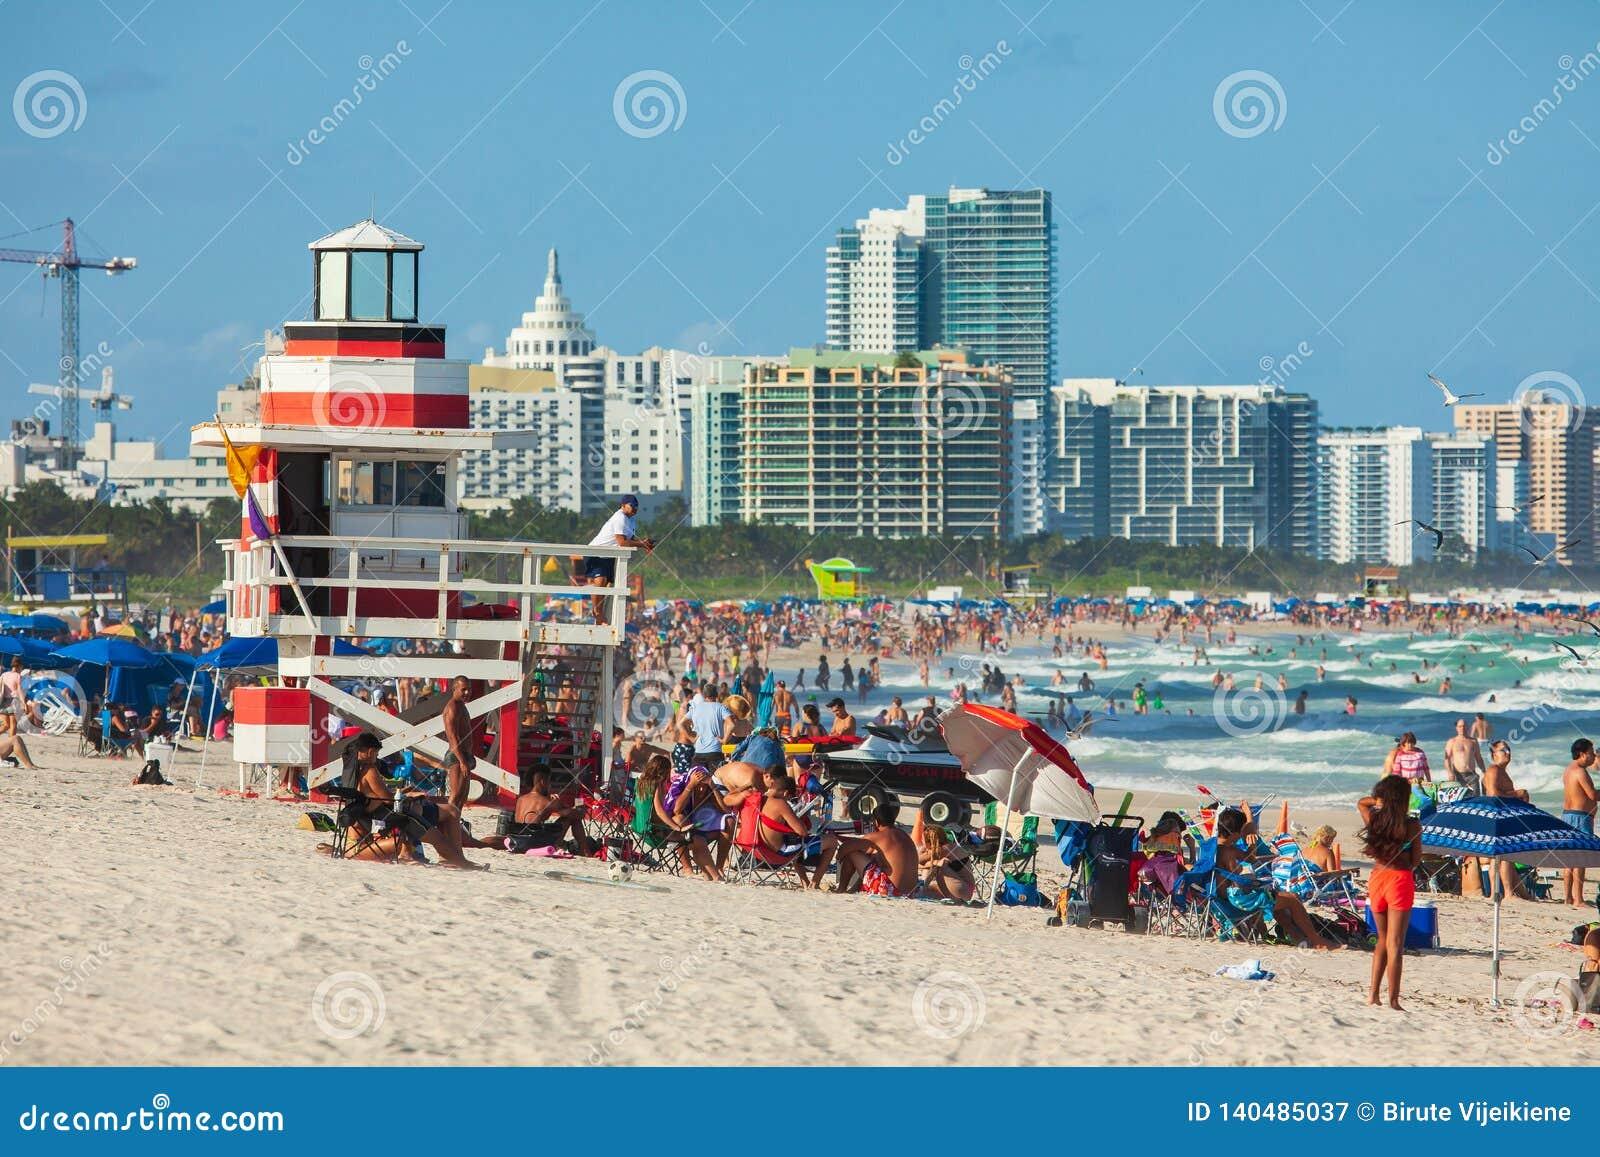 Zuidenstrand in het Strand van Miami, Florida, Verenigde Staten